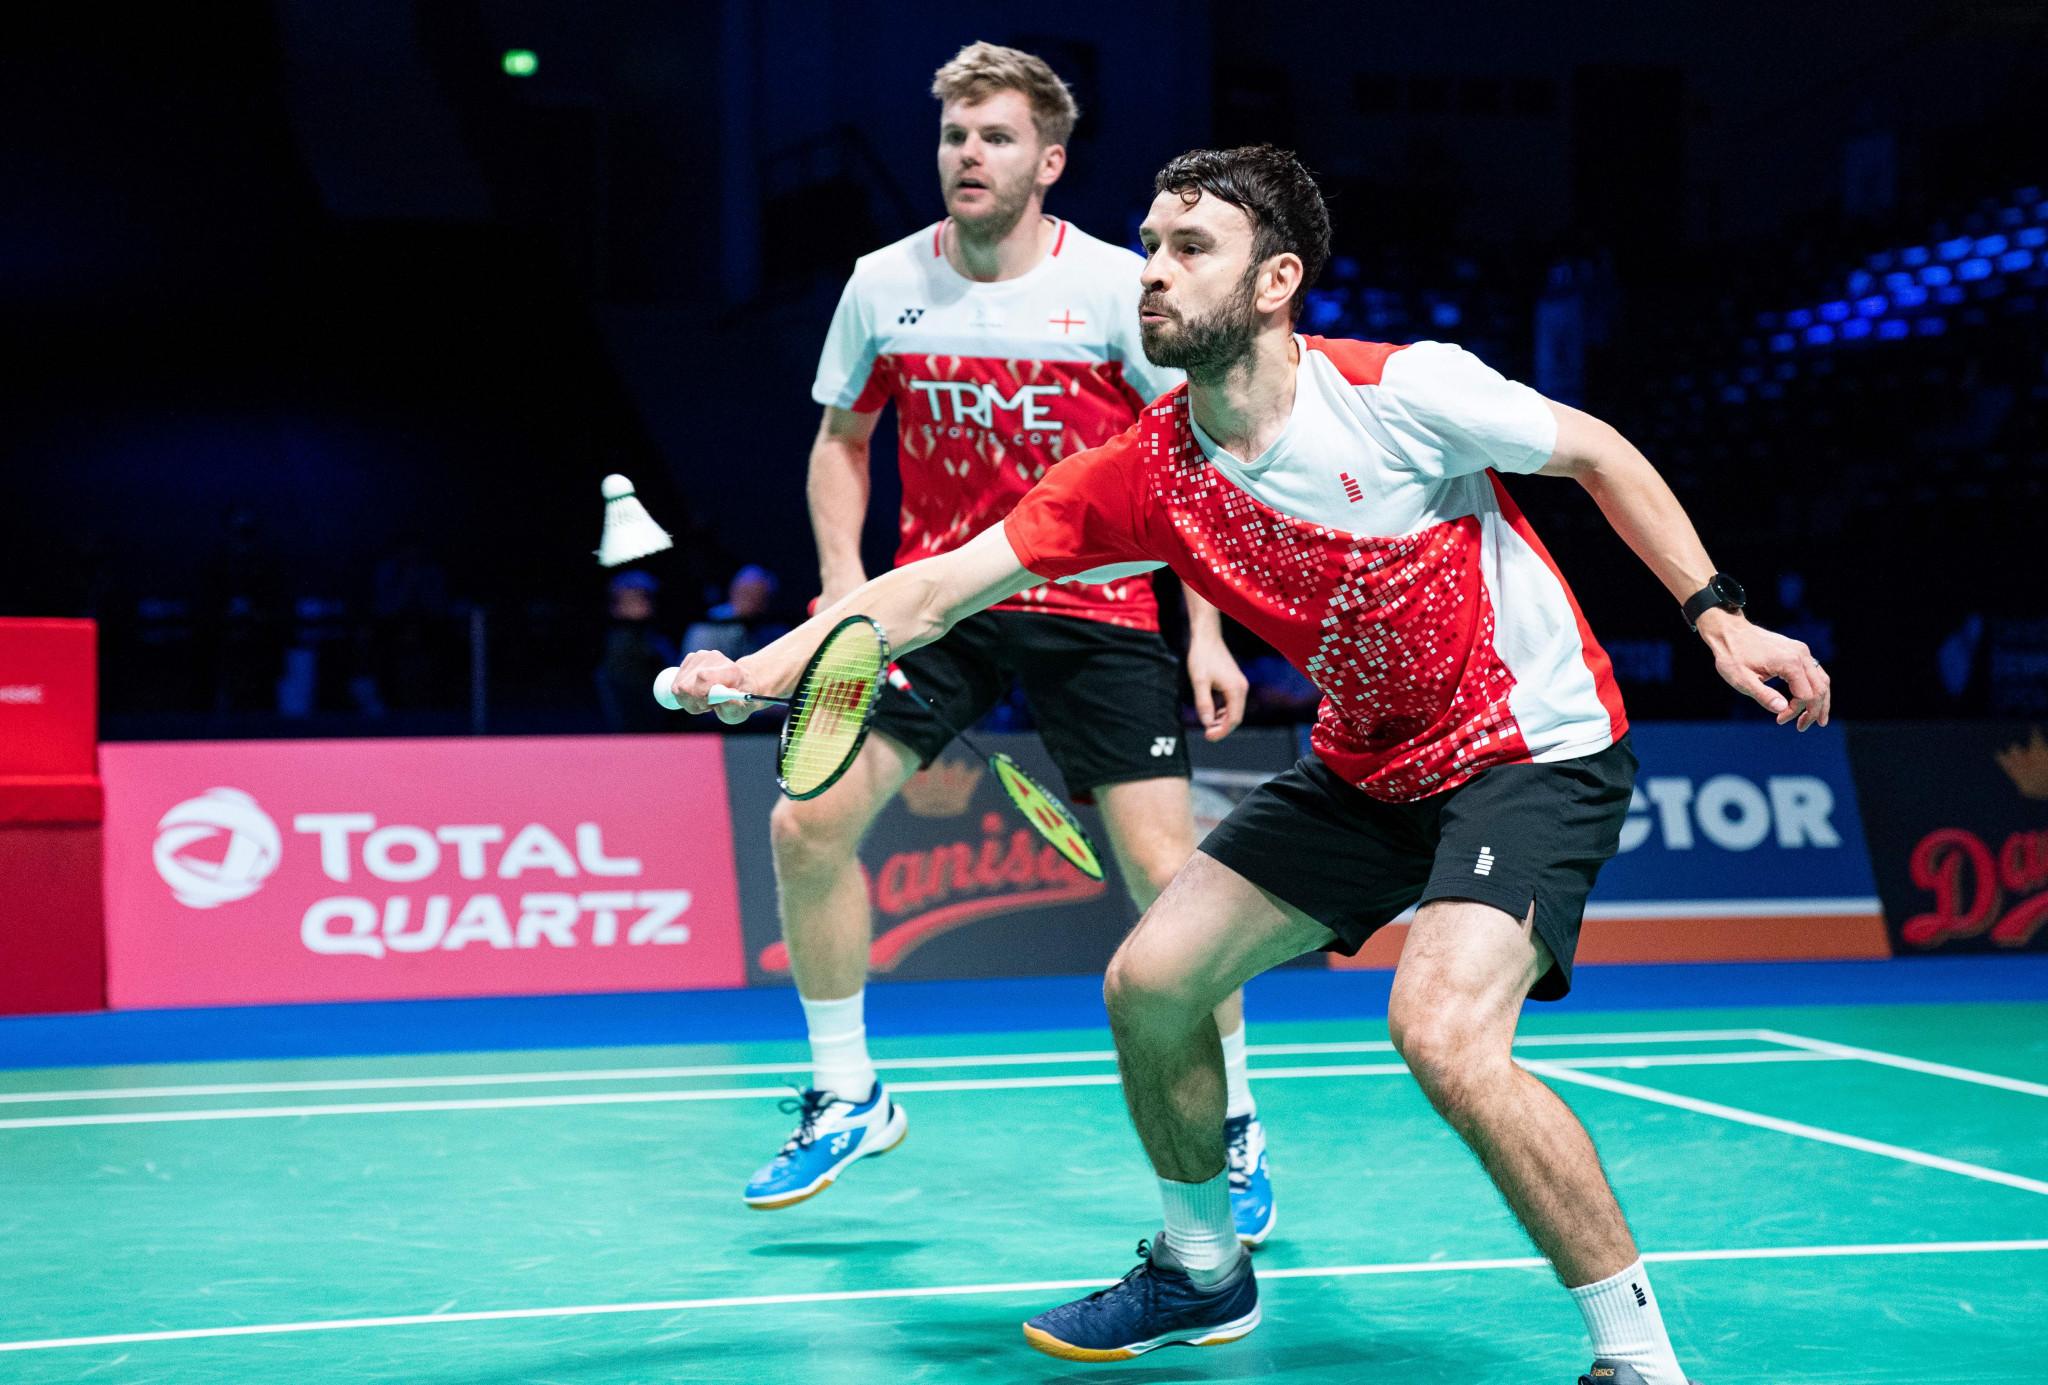 Langridge and Ellis slam Badminton England after Tokyo 2020 doubles omission